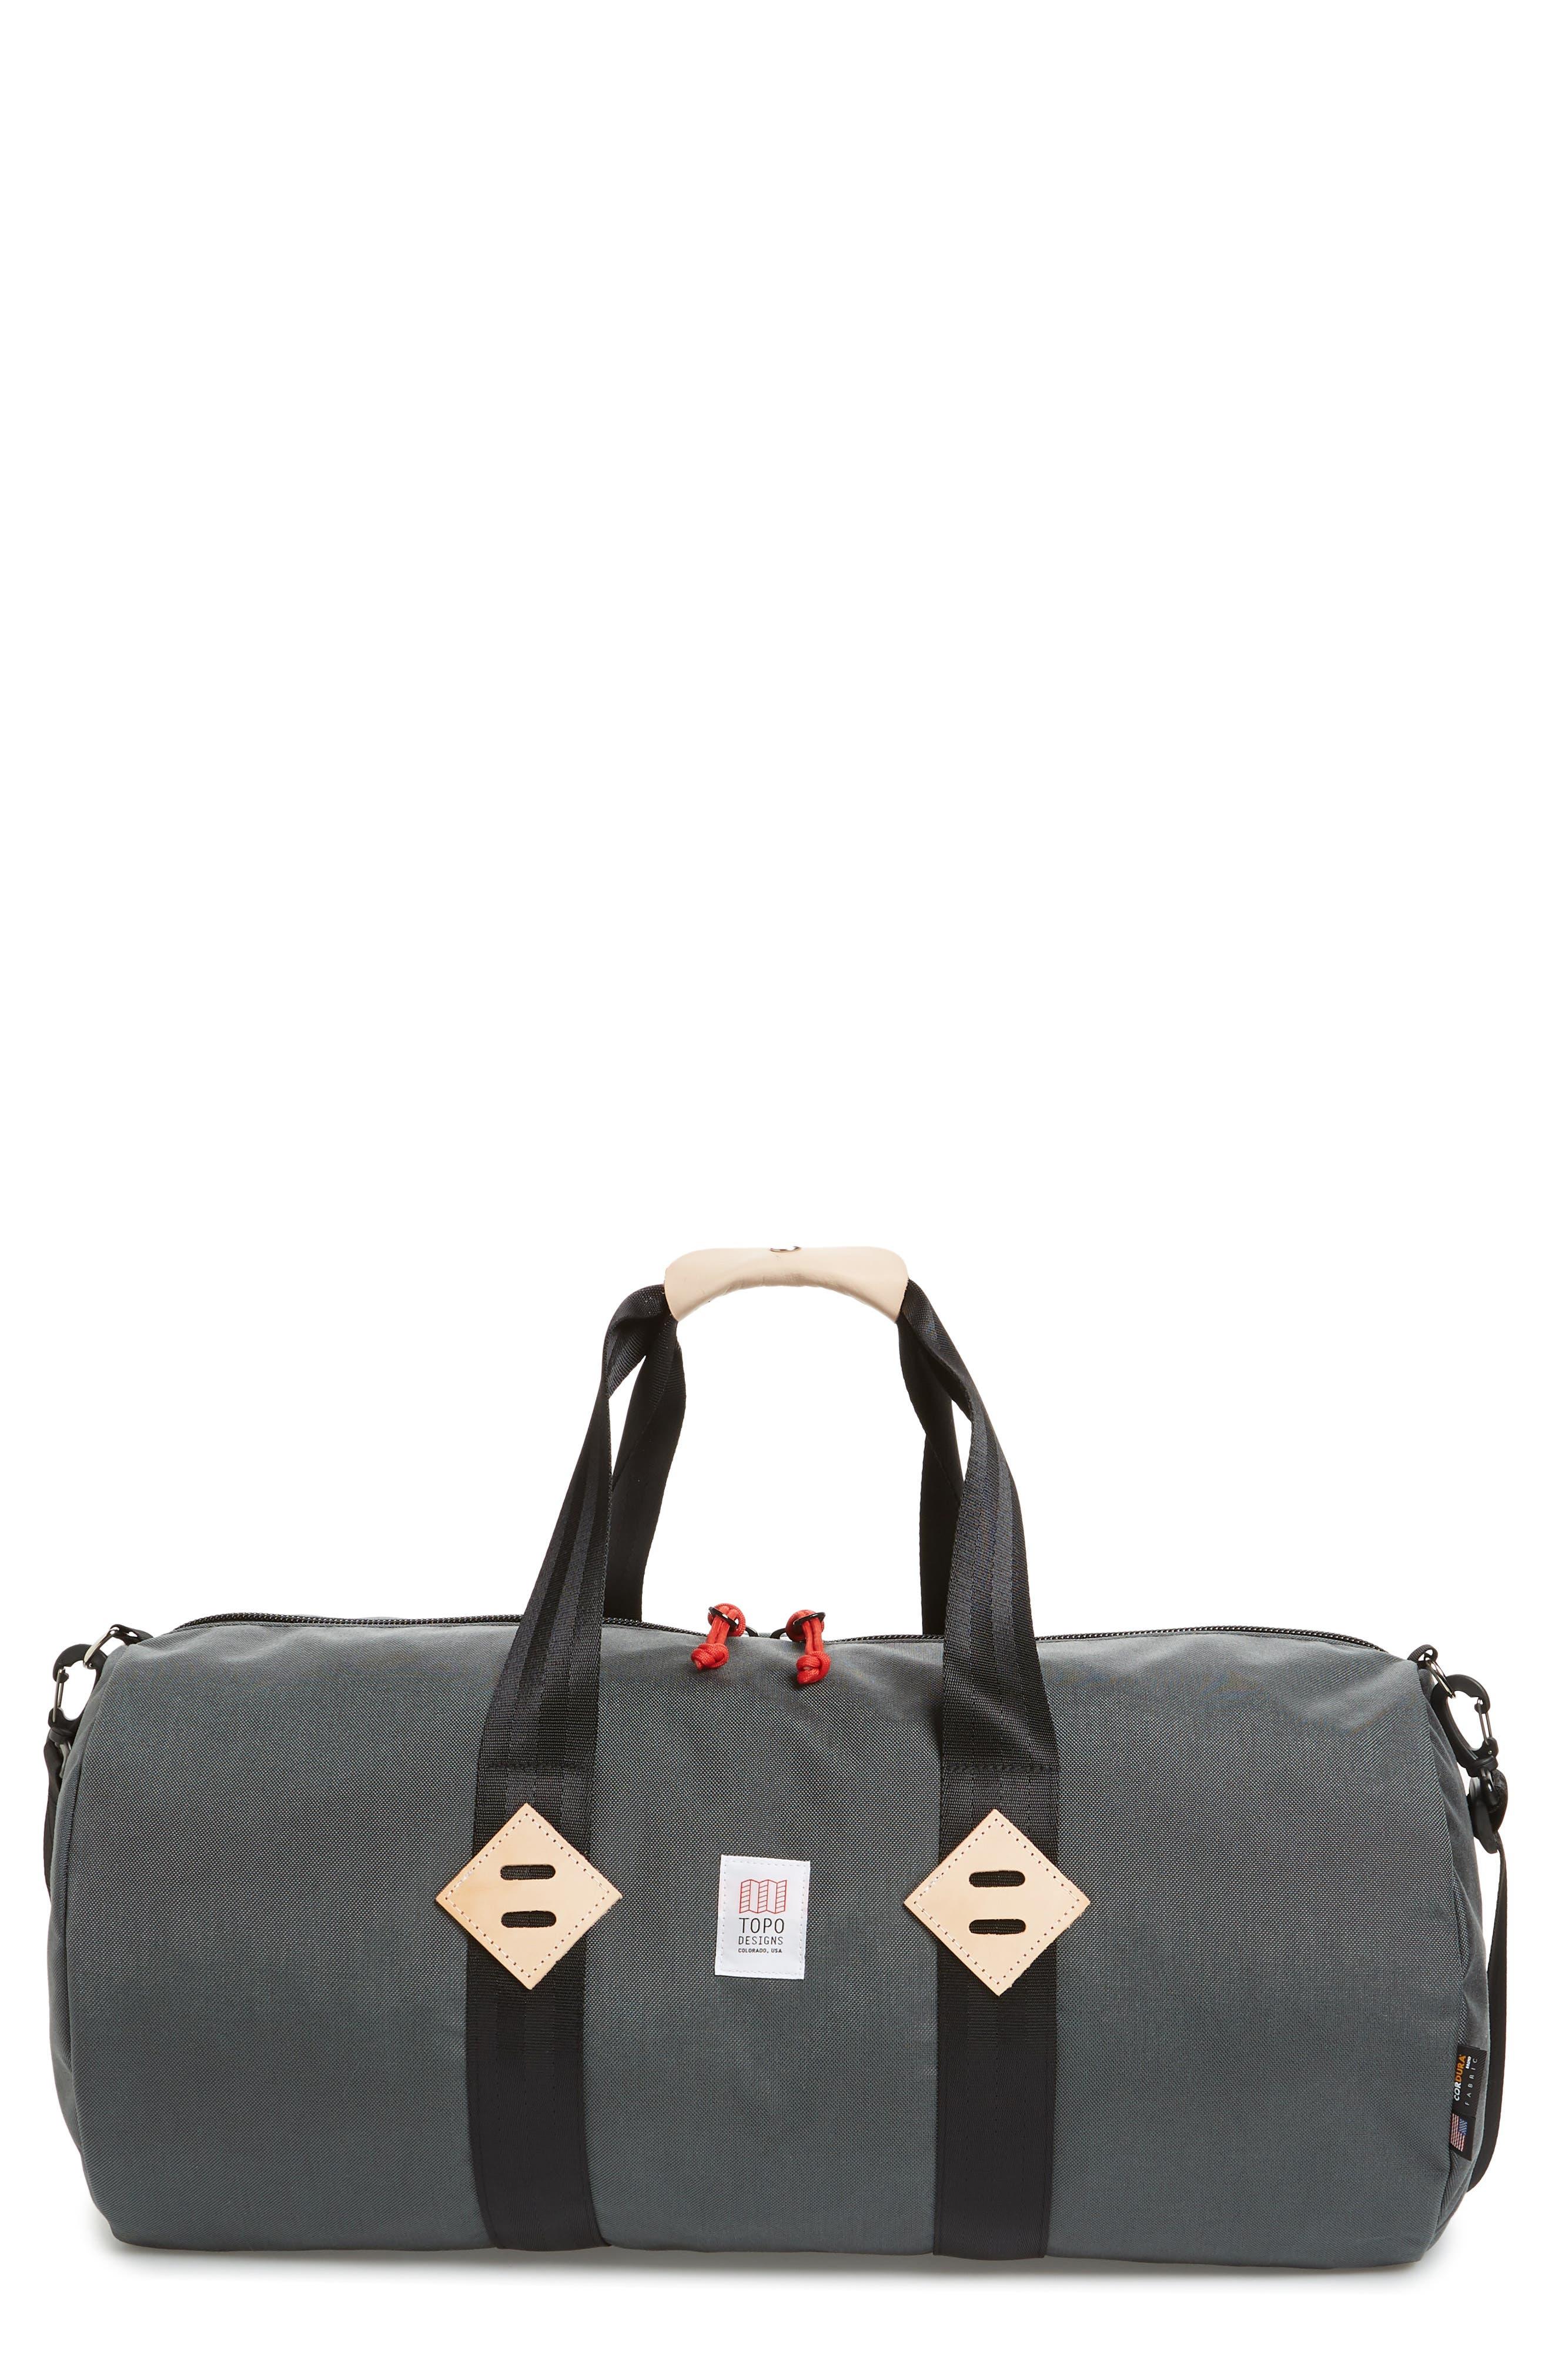 Classic Duffel Bag,                         Main,                         color, CHARCOAL